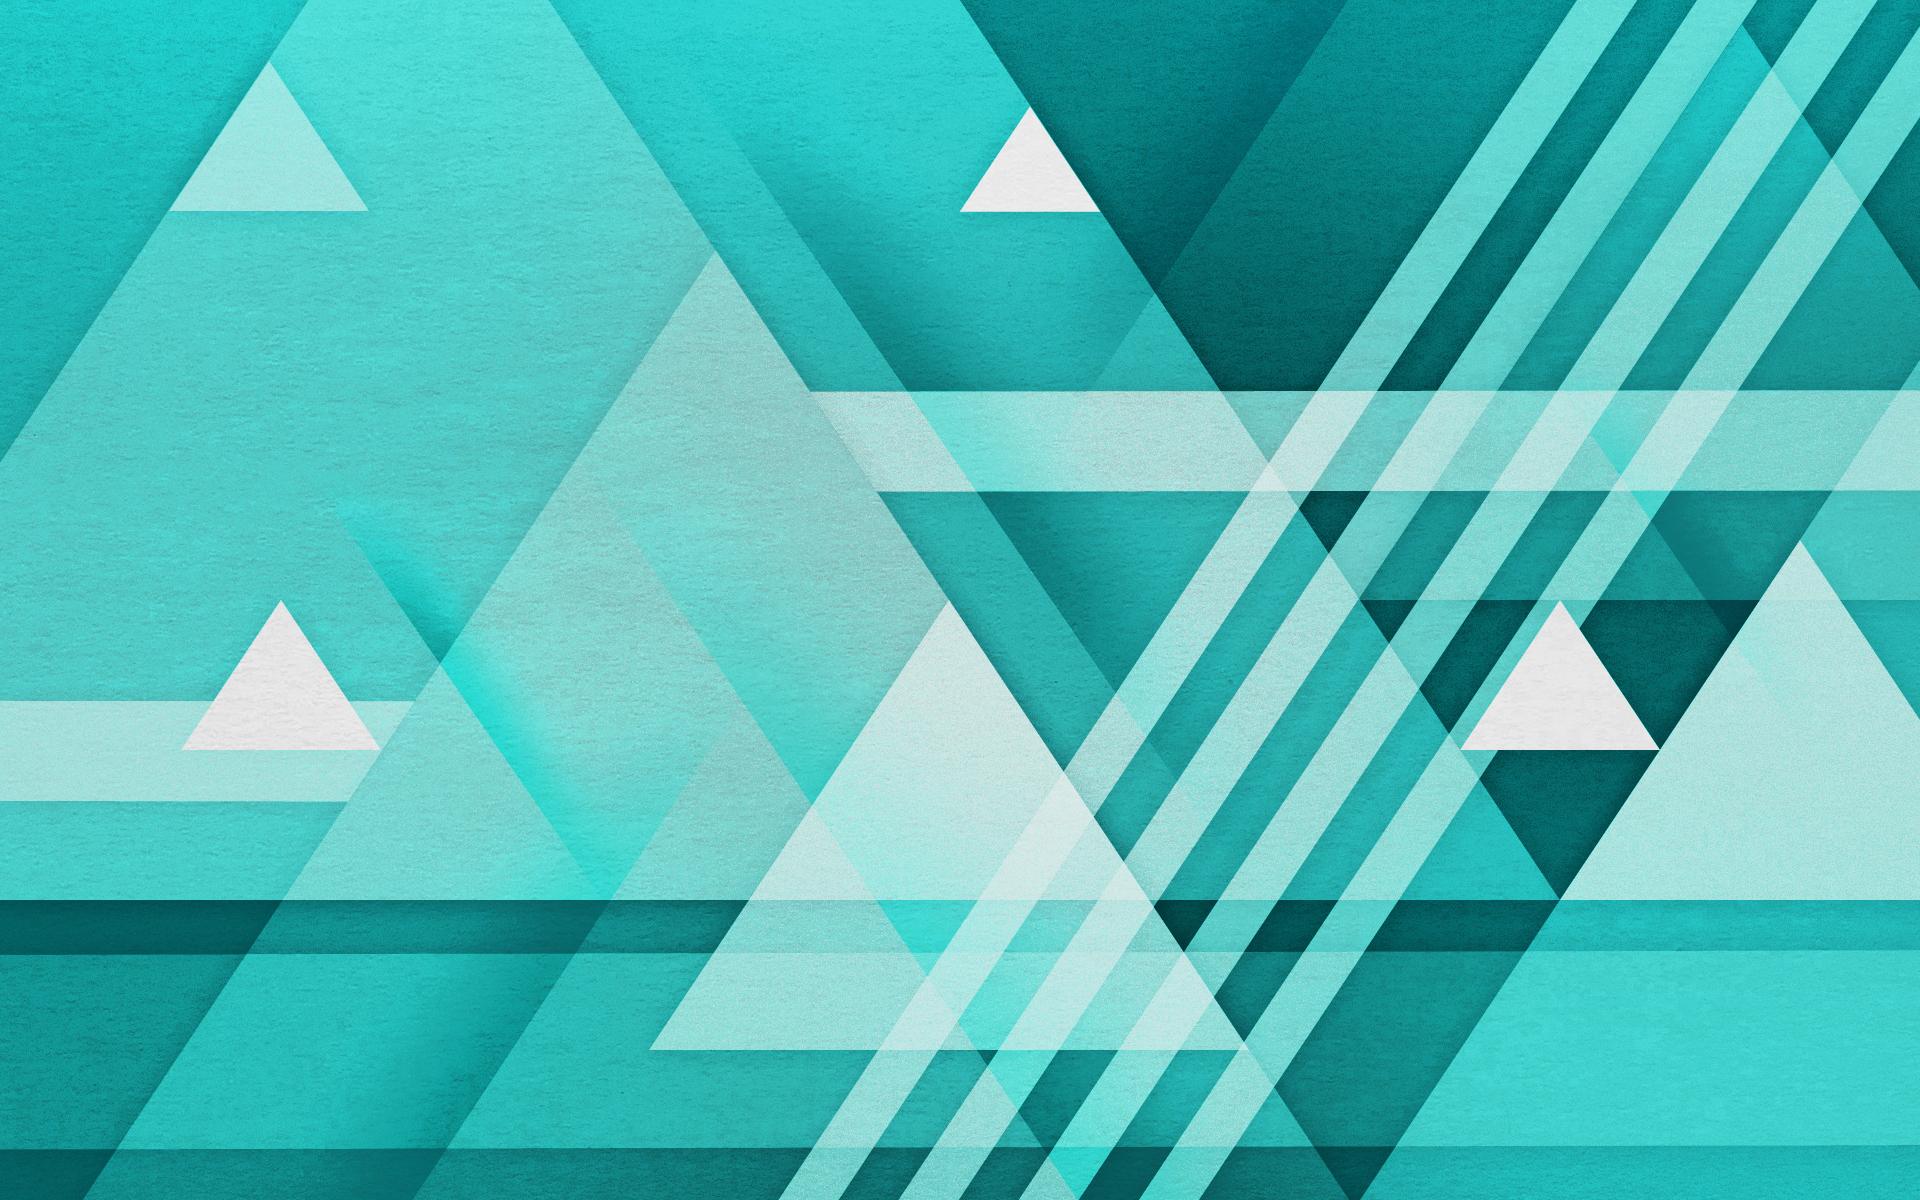 wallpapers love hd download